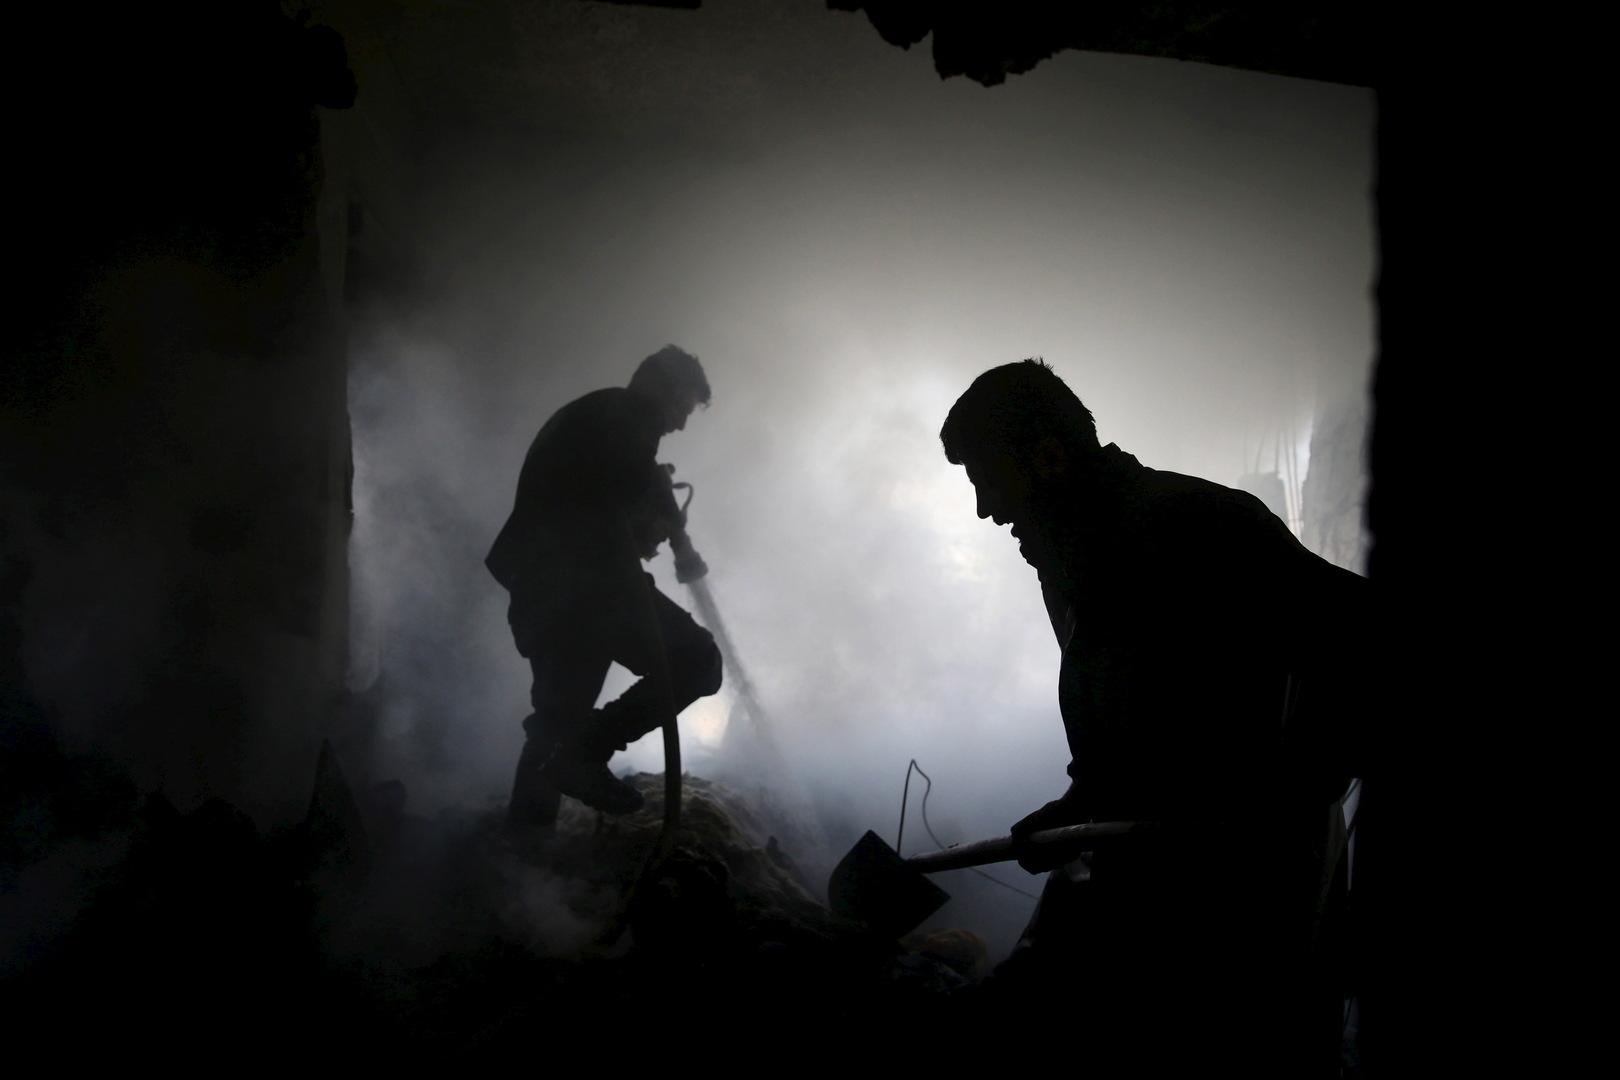 سوريا - أرشيف